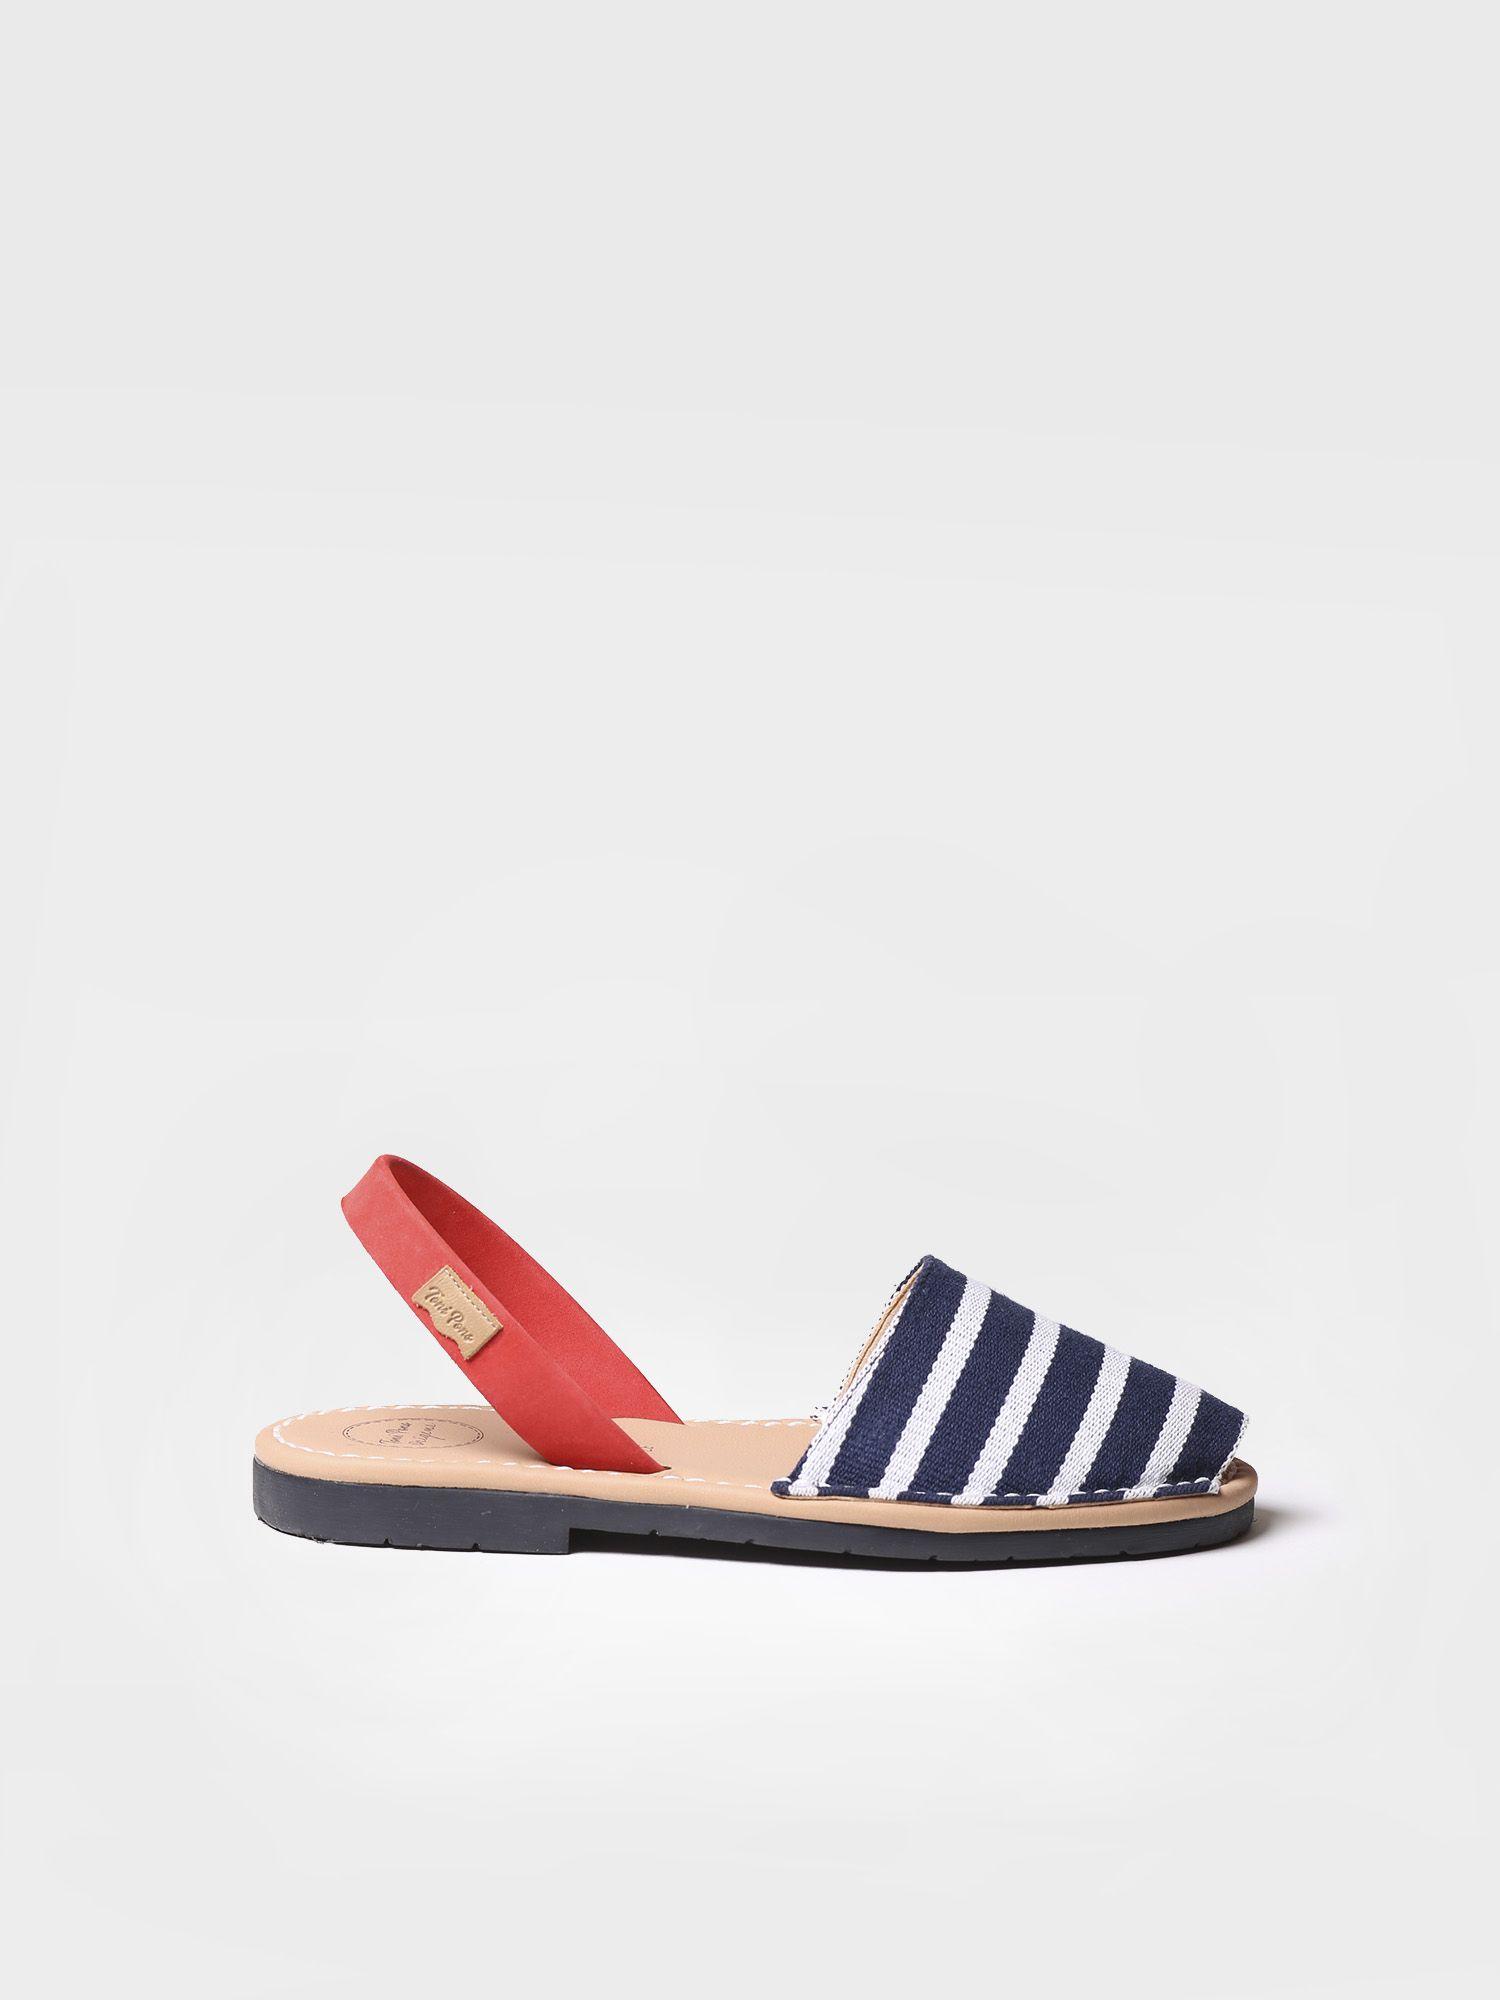 Striped menorquine sandals - MAO-BR